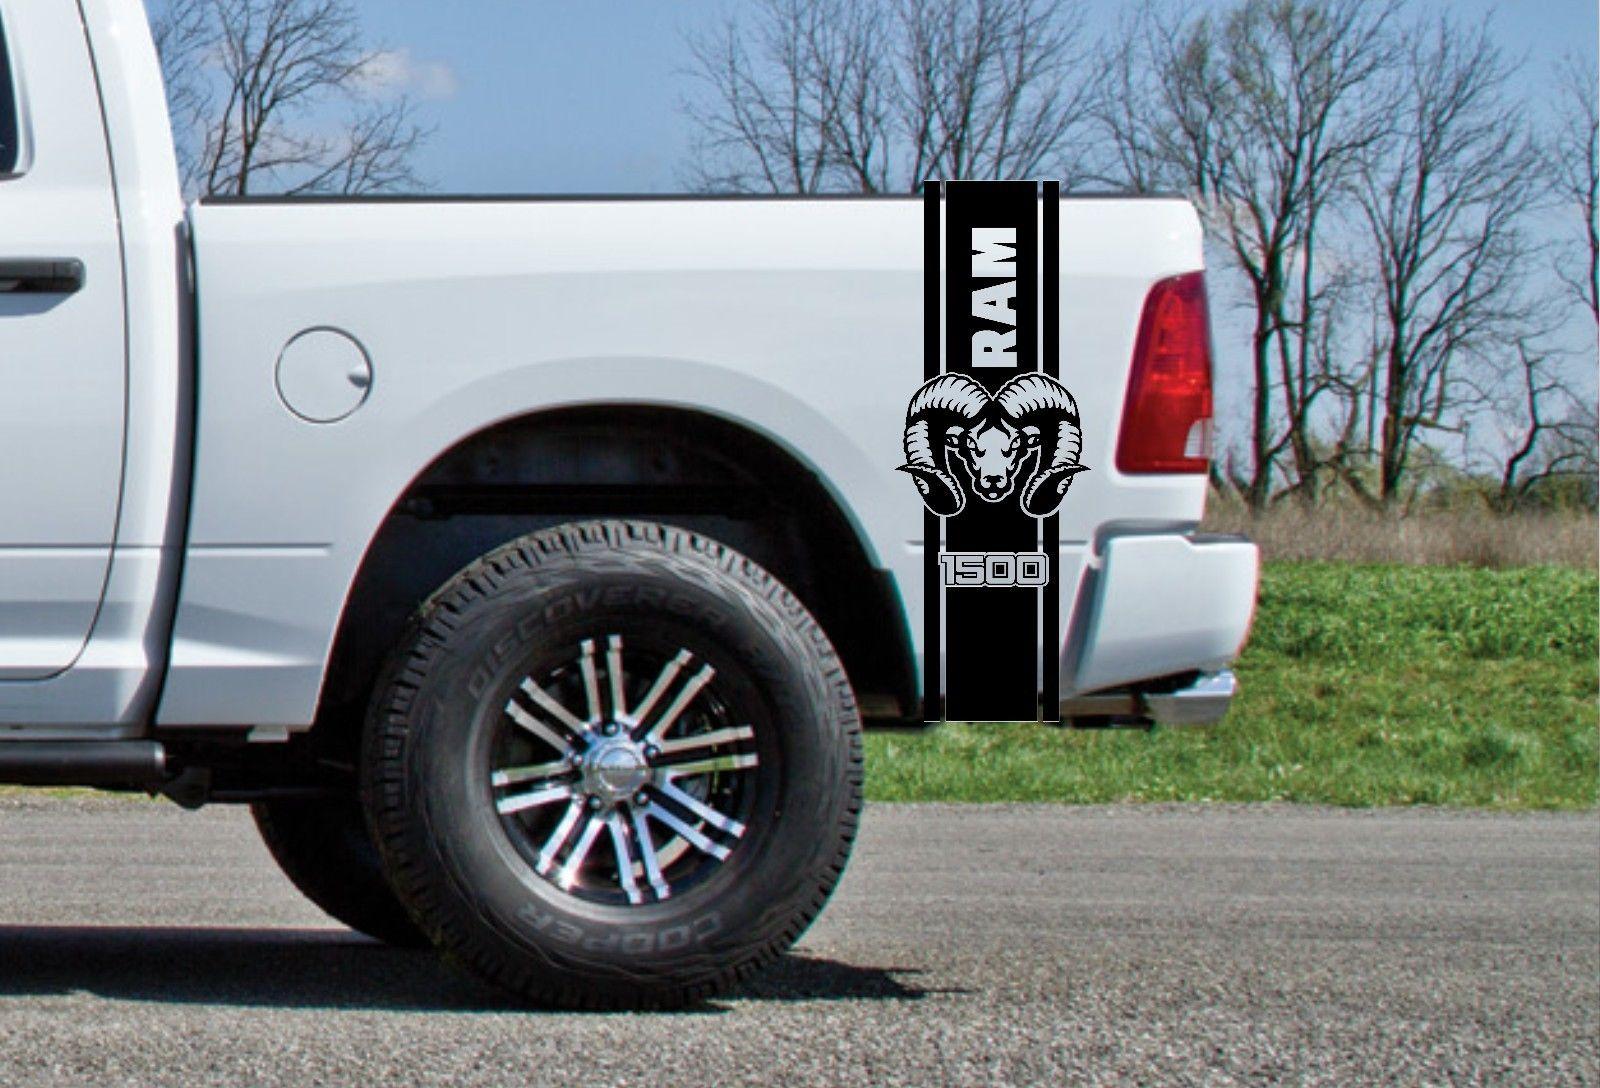 kit fits vinyl truck ram stripes line graphics decals side dodge models spears spikes hustle body hood